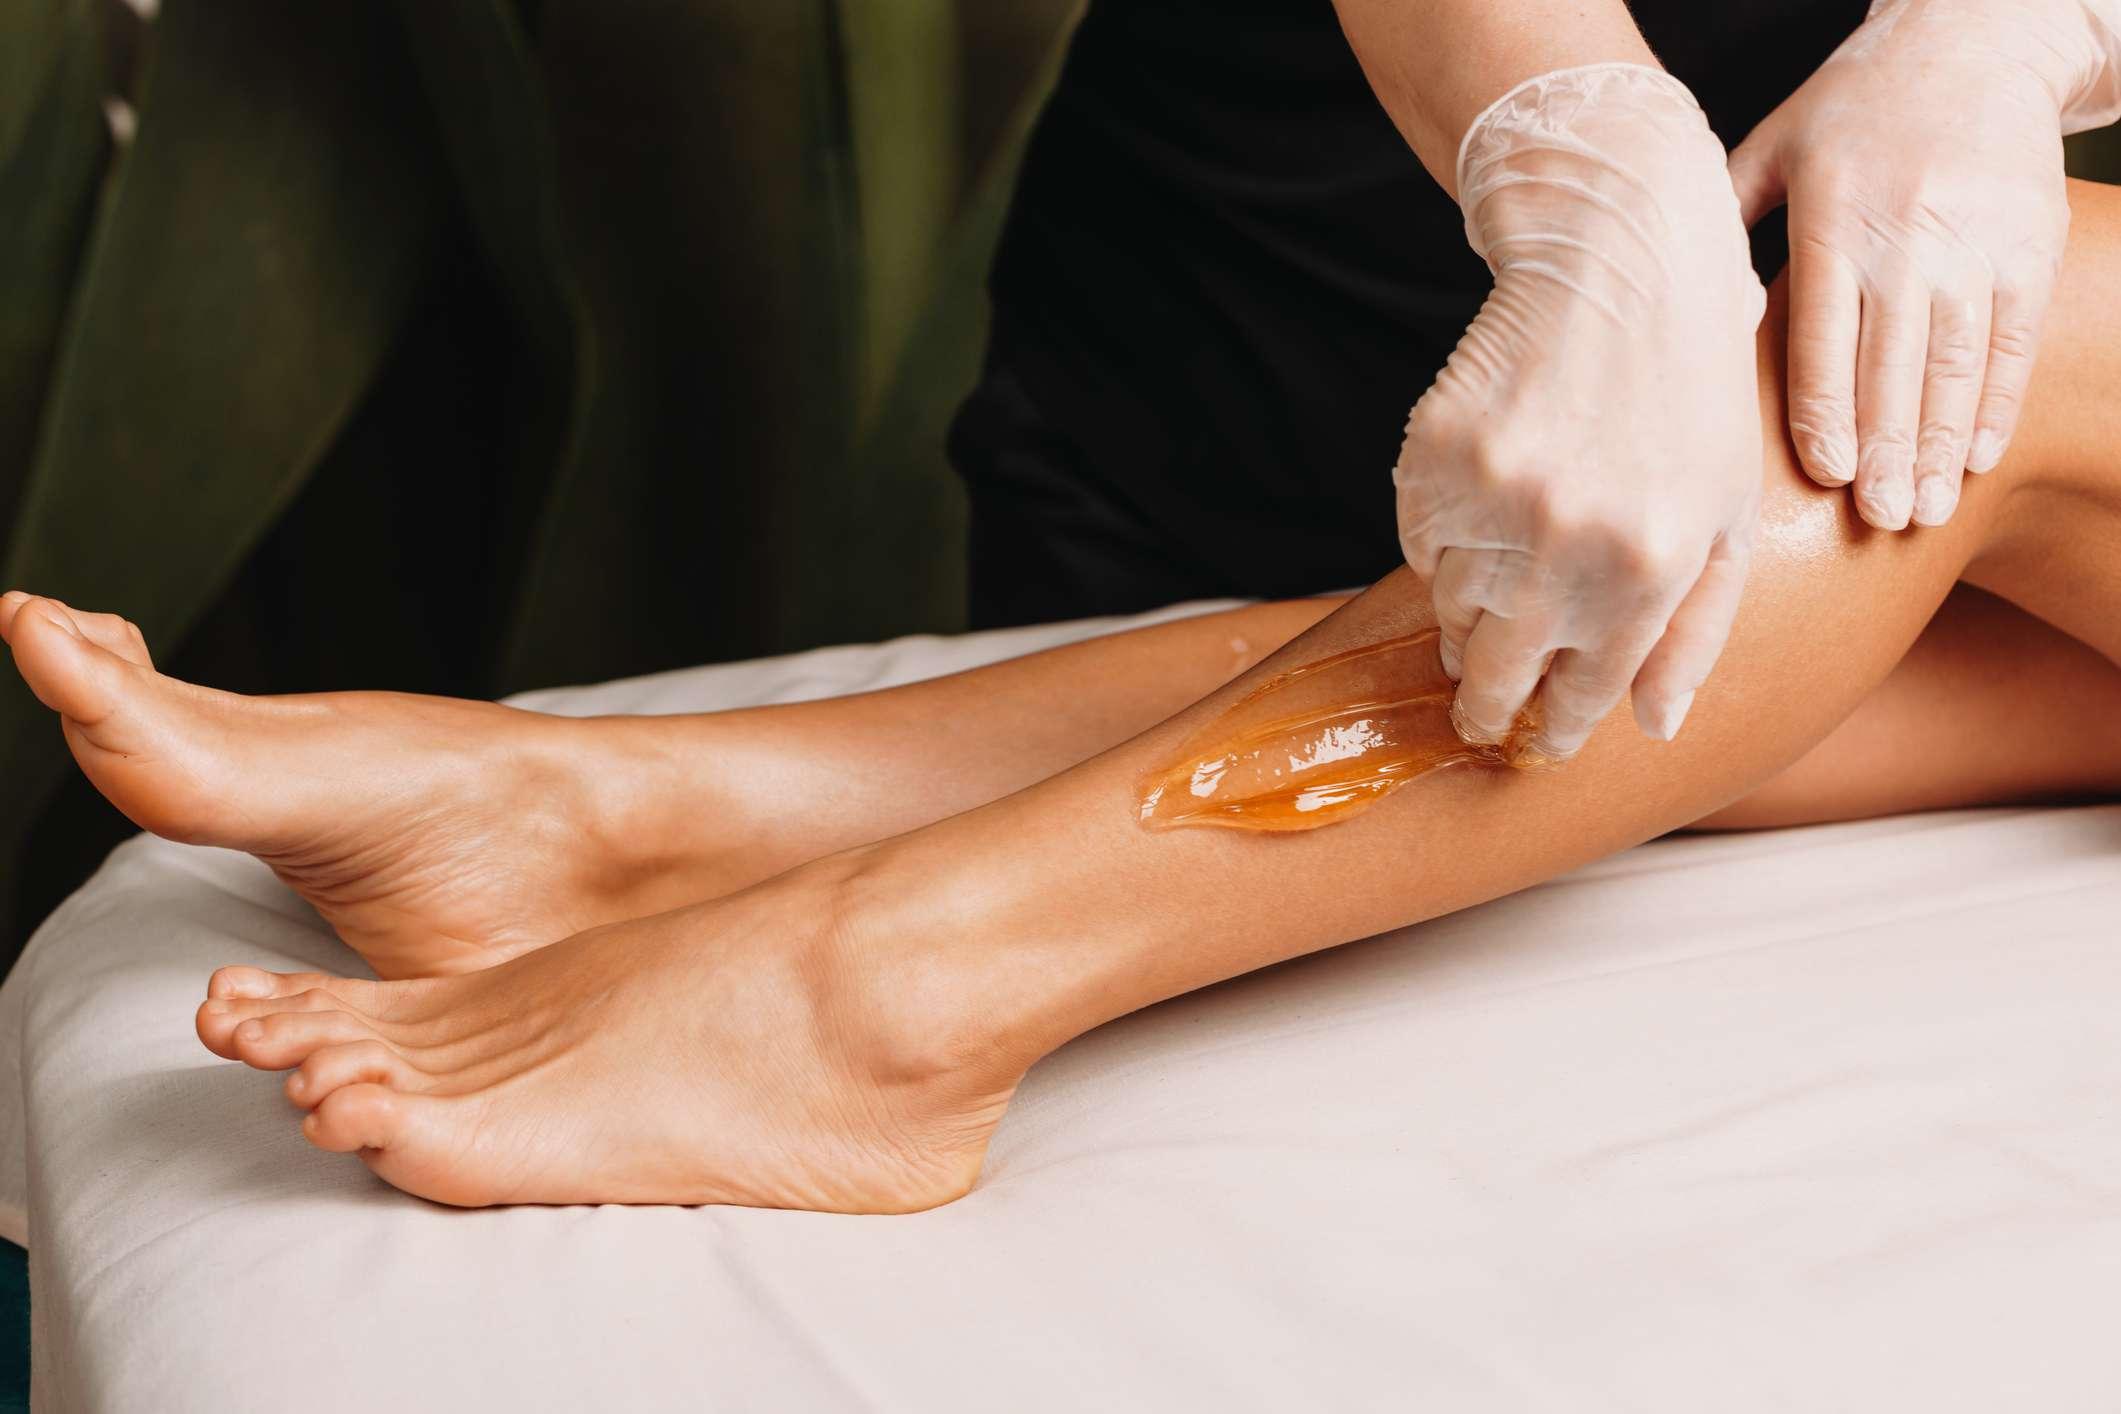 person getting their legs waxed